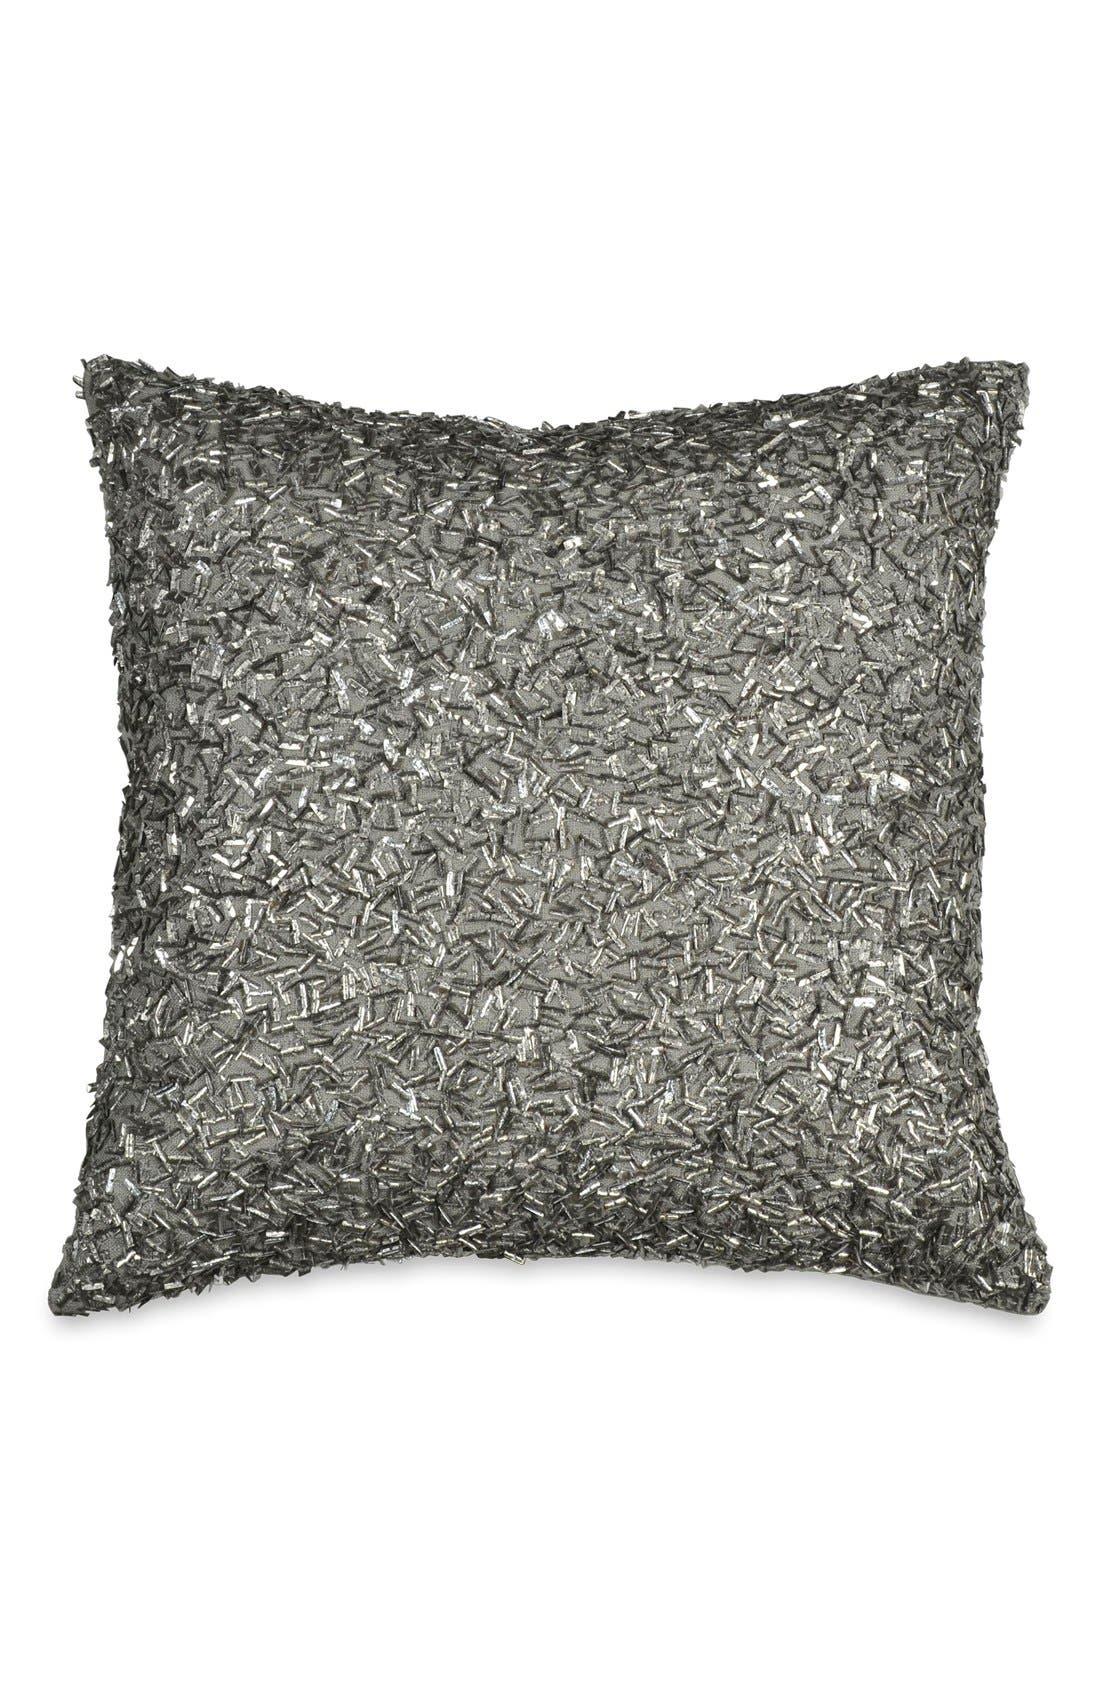 Main Image - Donna Karan Collection 'Exhale' Pillow